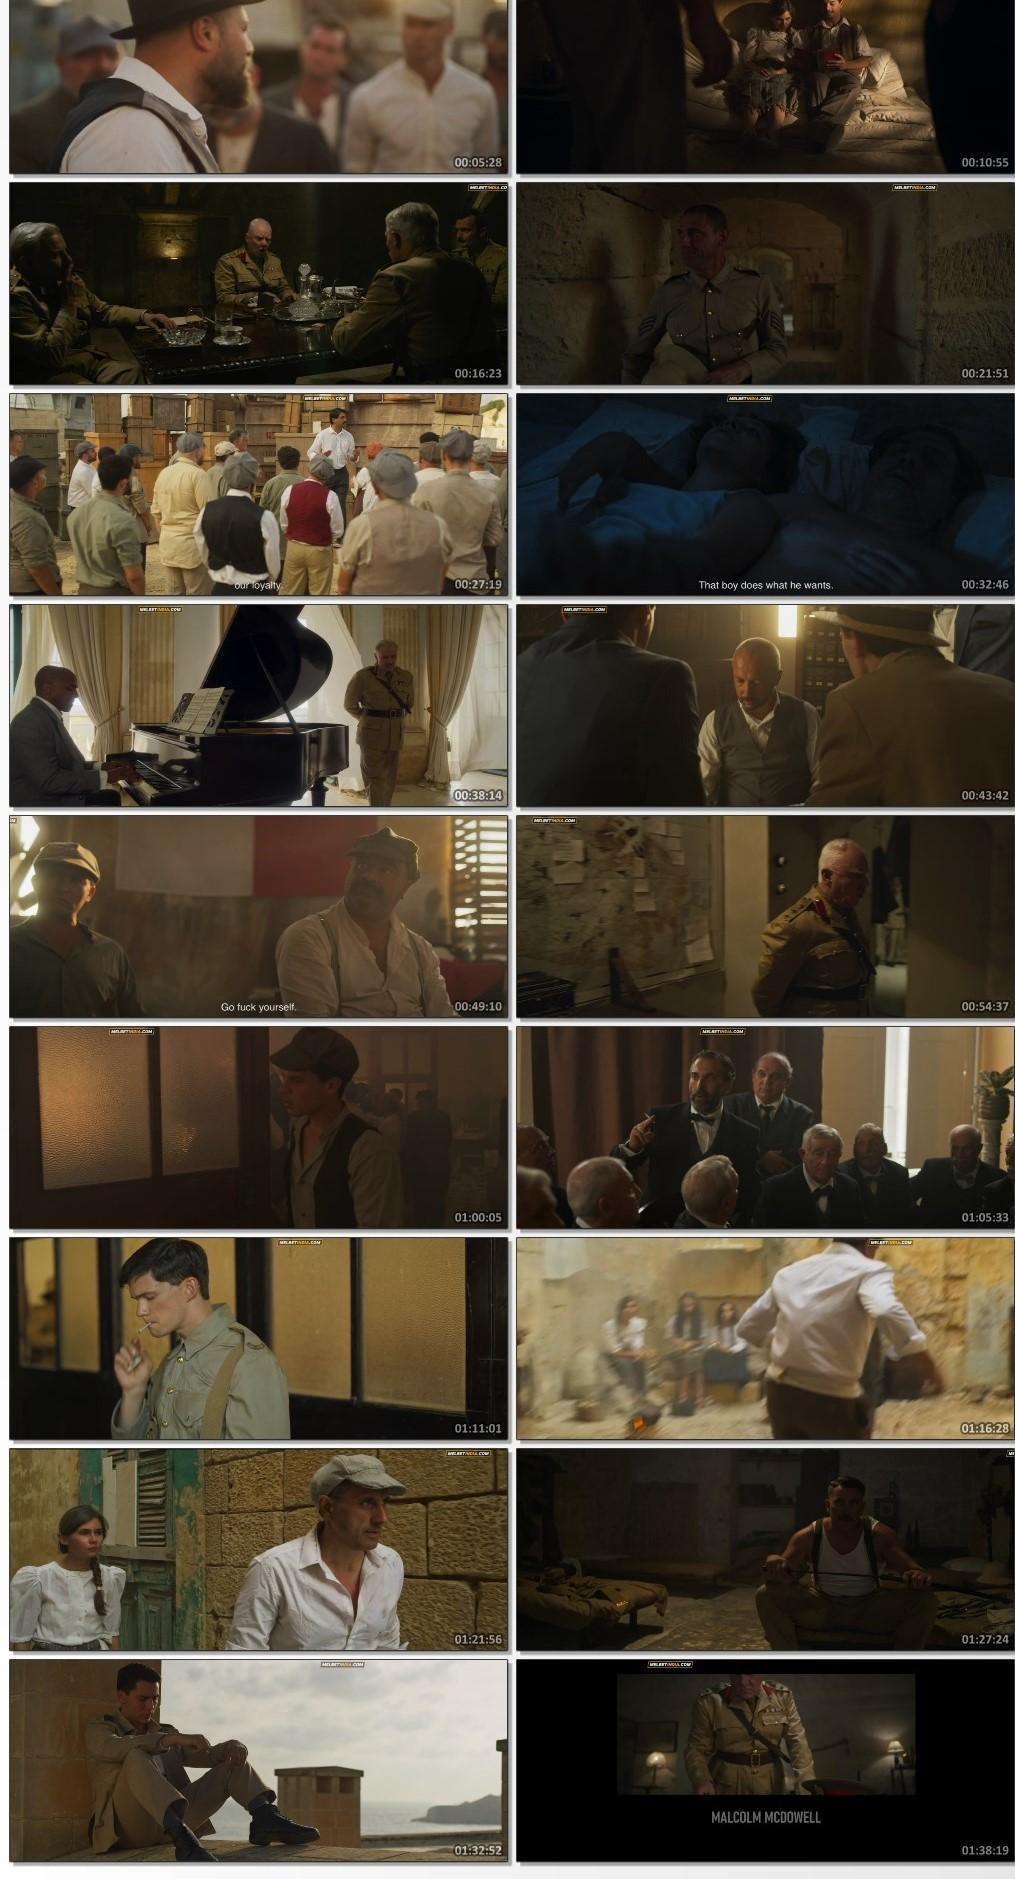 Just-Noise-2021-Hindi-Dubbed-1080p-7-Star-HD-Mx-mkv-thumbsb3a5dbf03e398dca